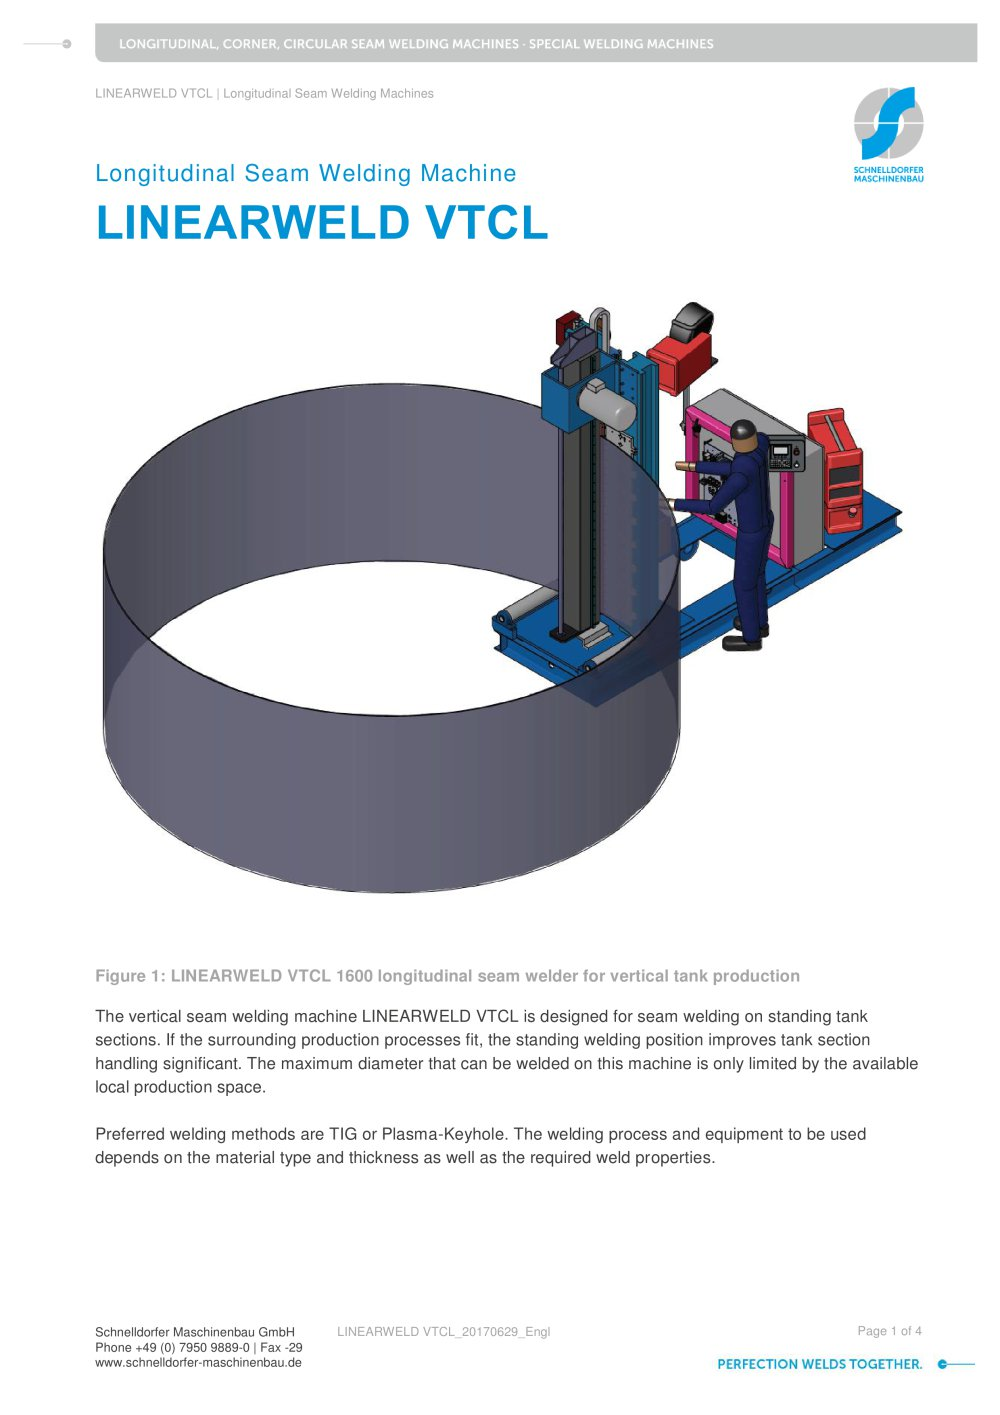 Linearweld Vtcl Schnelldorfer Maschinenbau Pdf Catalogue Gas Welding Equipment Diagram 1 4 Pages